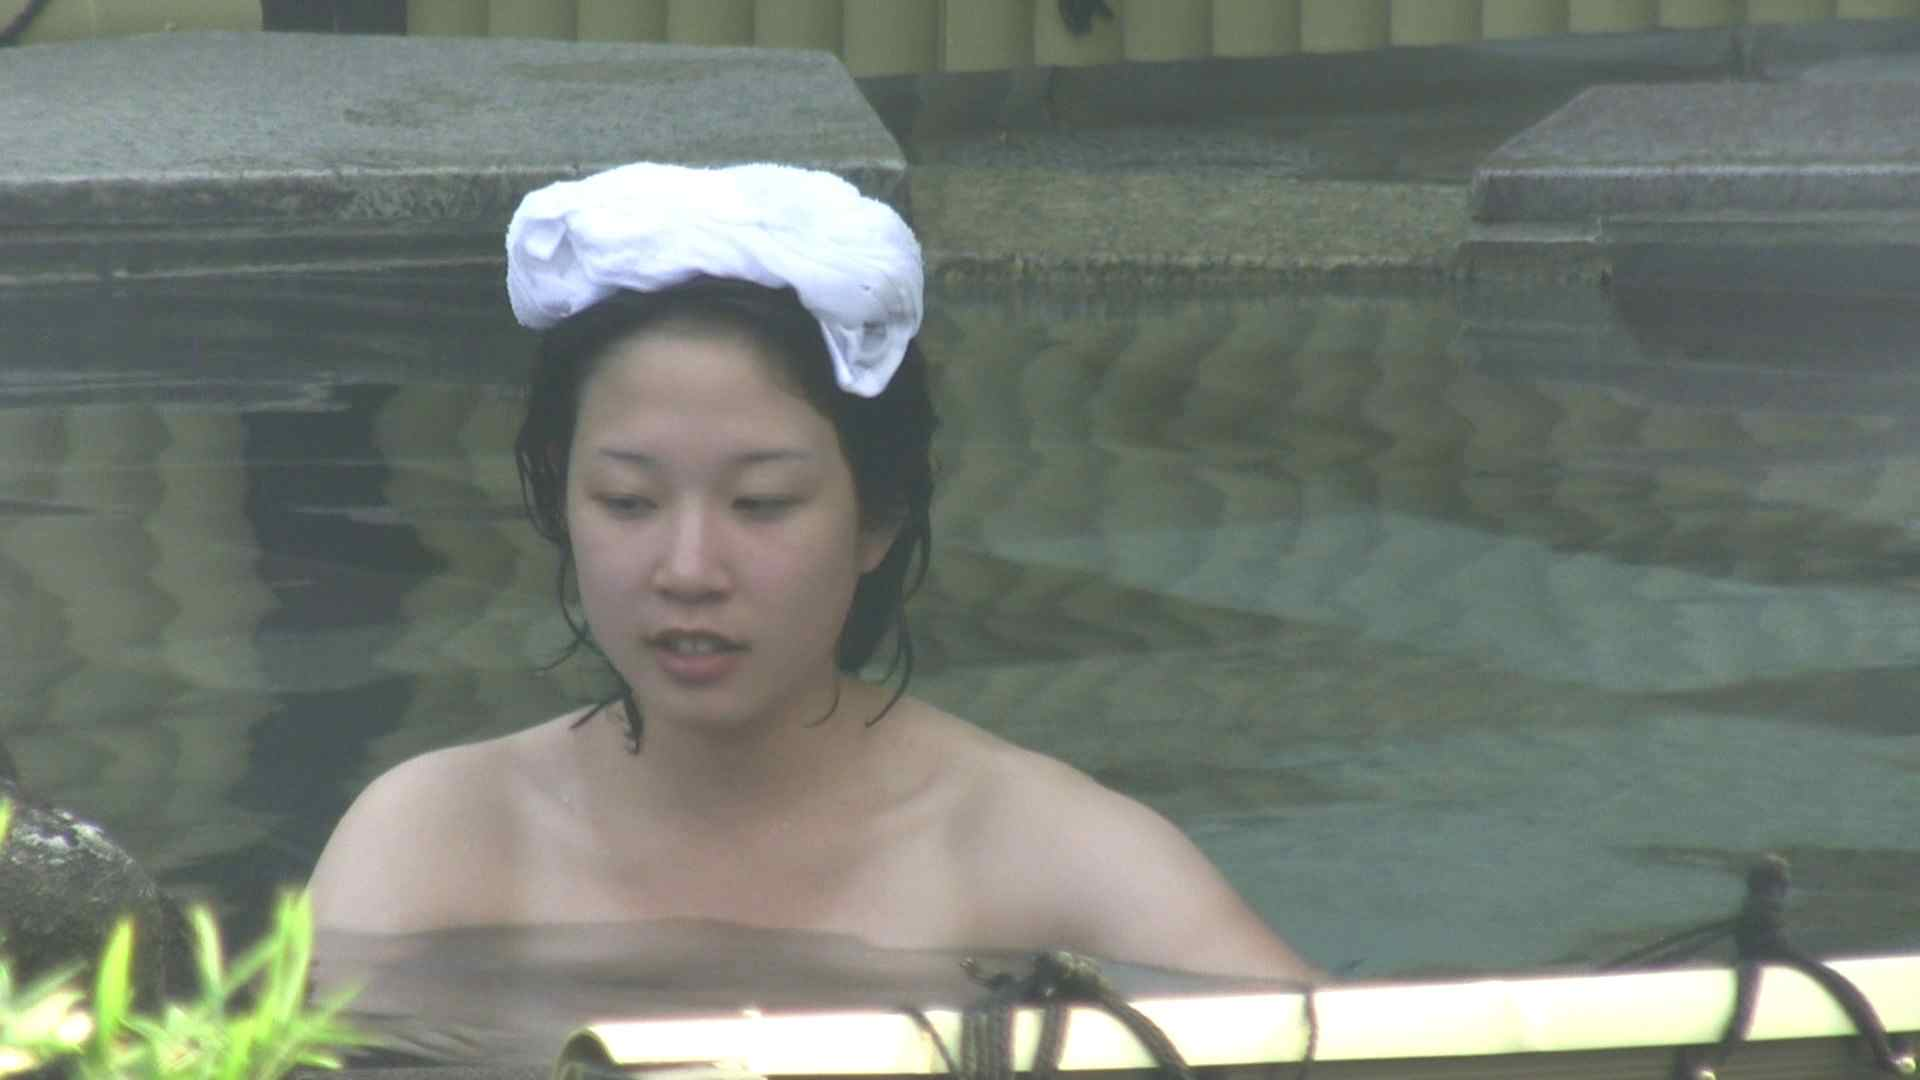 Aquaな露天風呂Vol.172 盗撮映像  113Pix 113